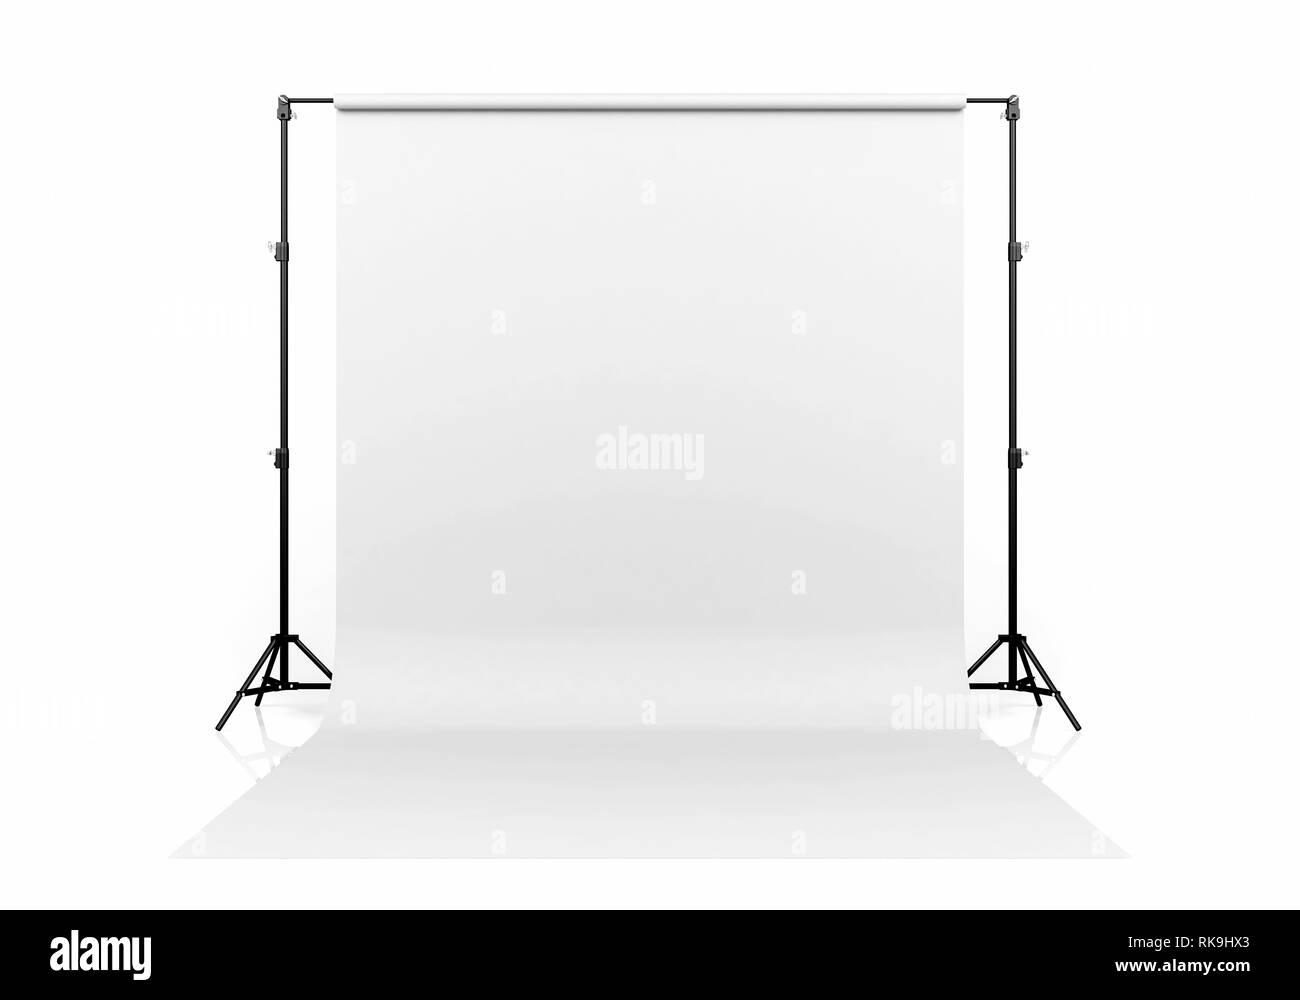 Photo Studio Lighting Set Up With White Backdrop On White